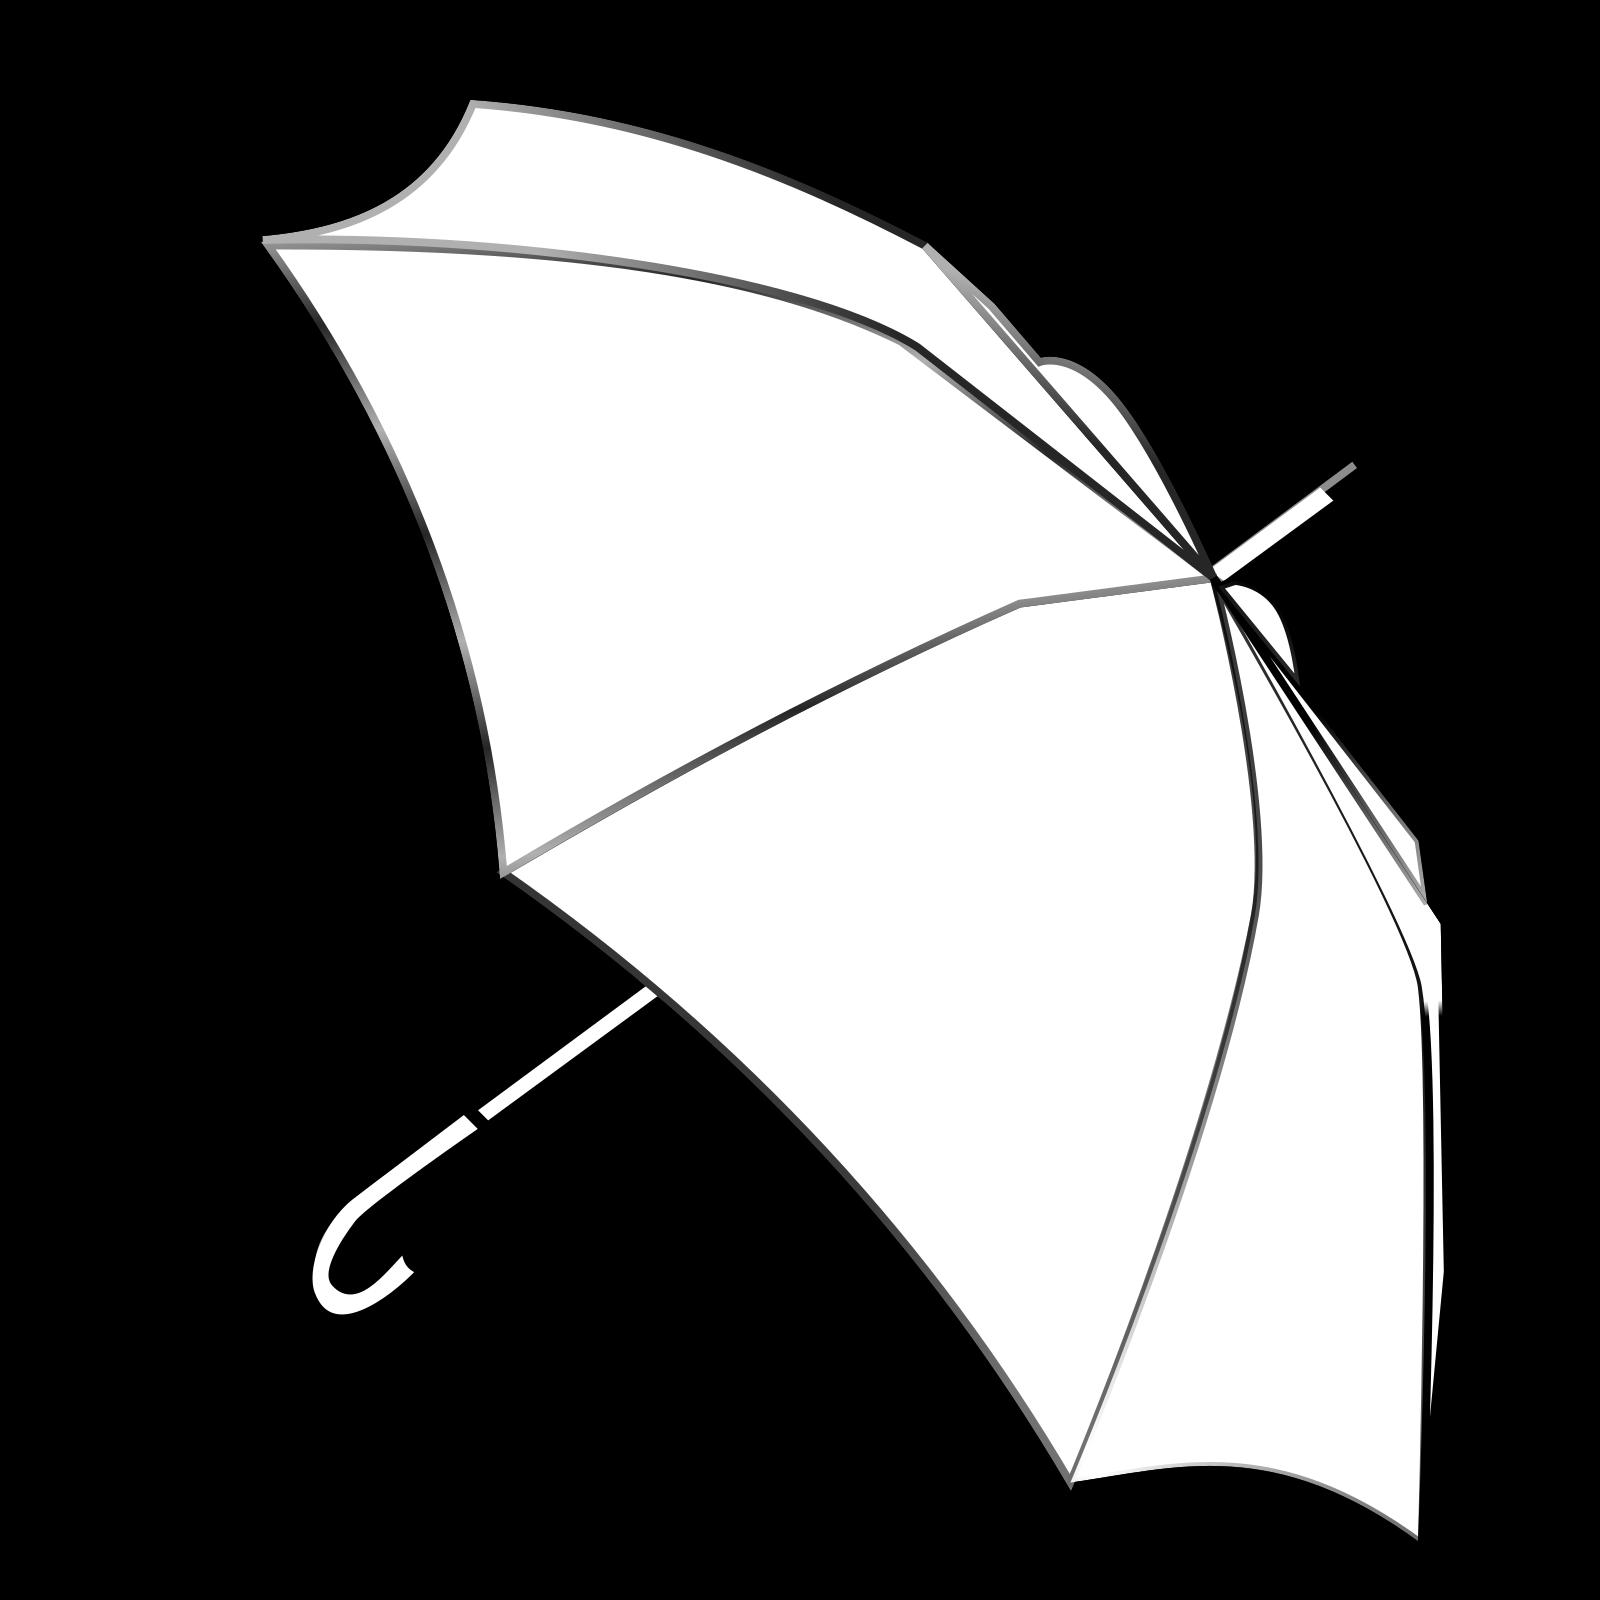 Umbrella Outline Svg Vector Umbrella Outline Clip Art Svg Clipart